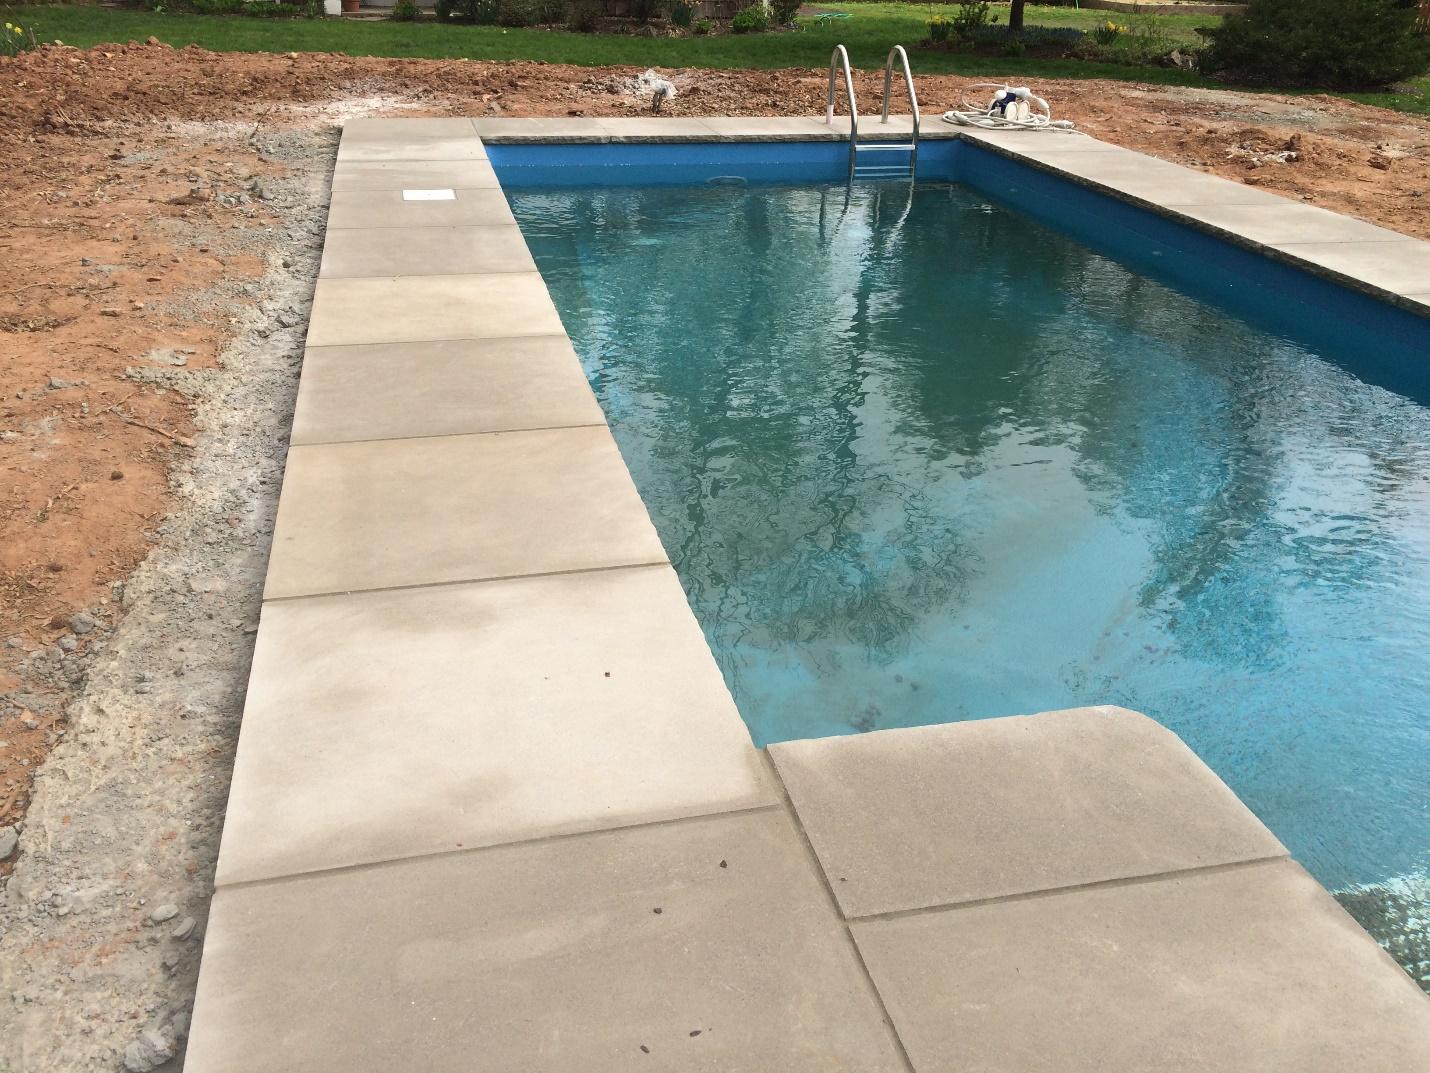 Levco Pools deckign after renovating